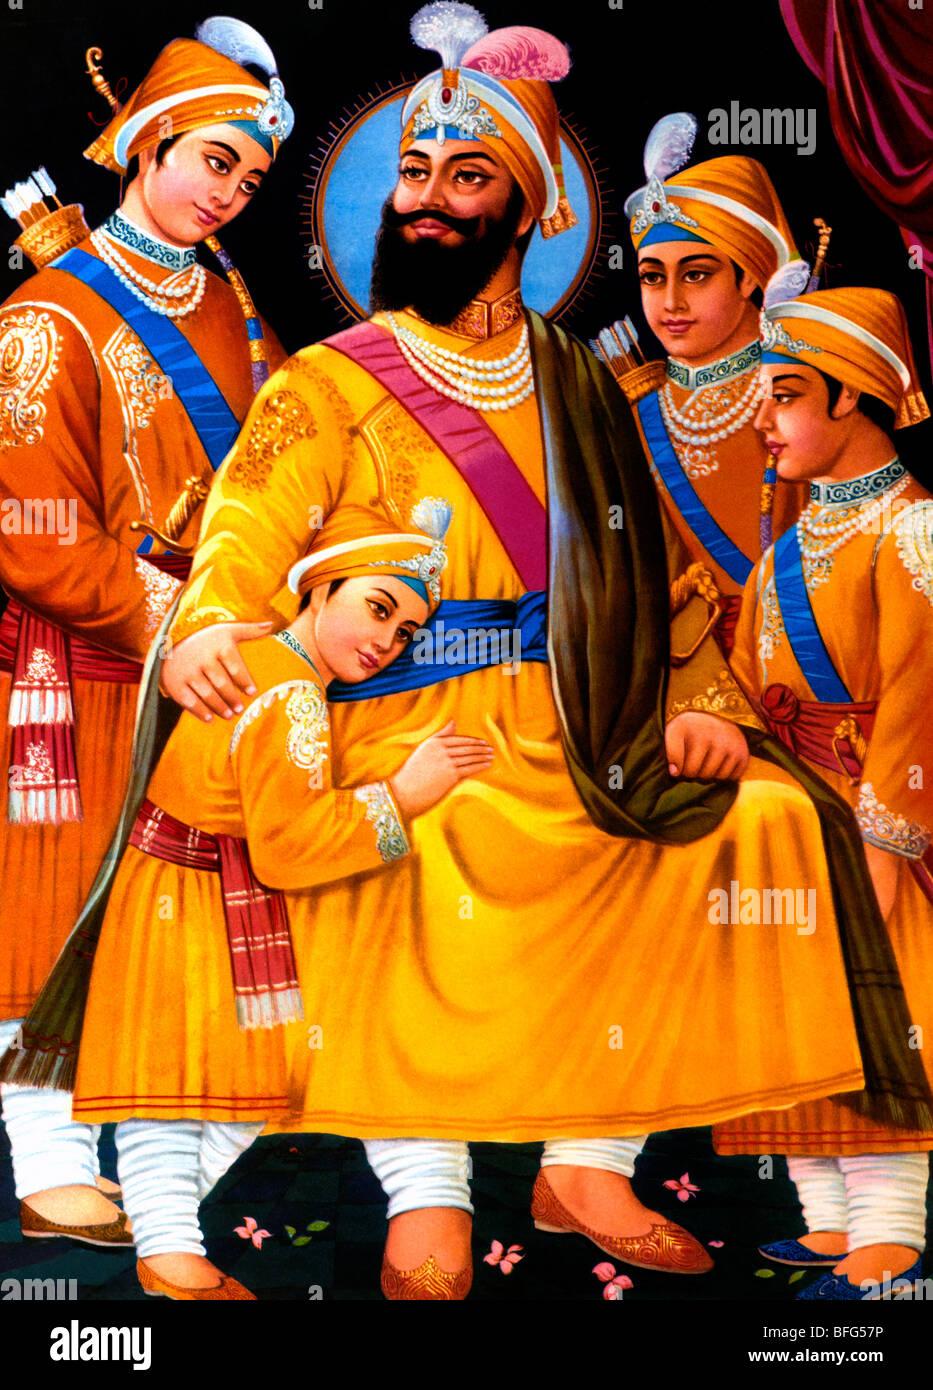 Guru Gobind Singh Stock Photos Guru Gobind Singh Stock Images Alamy